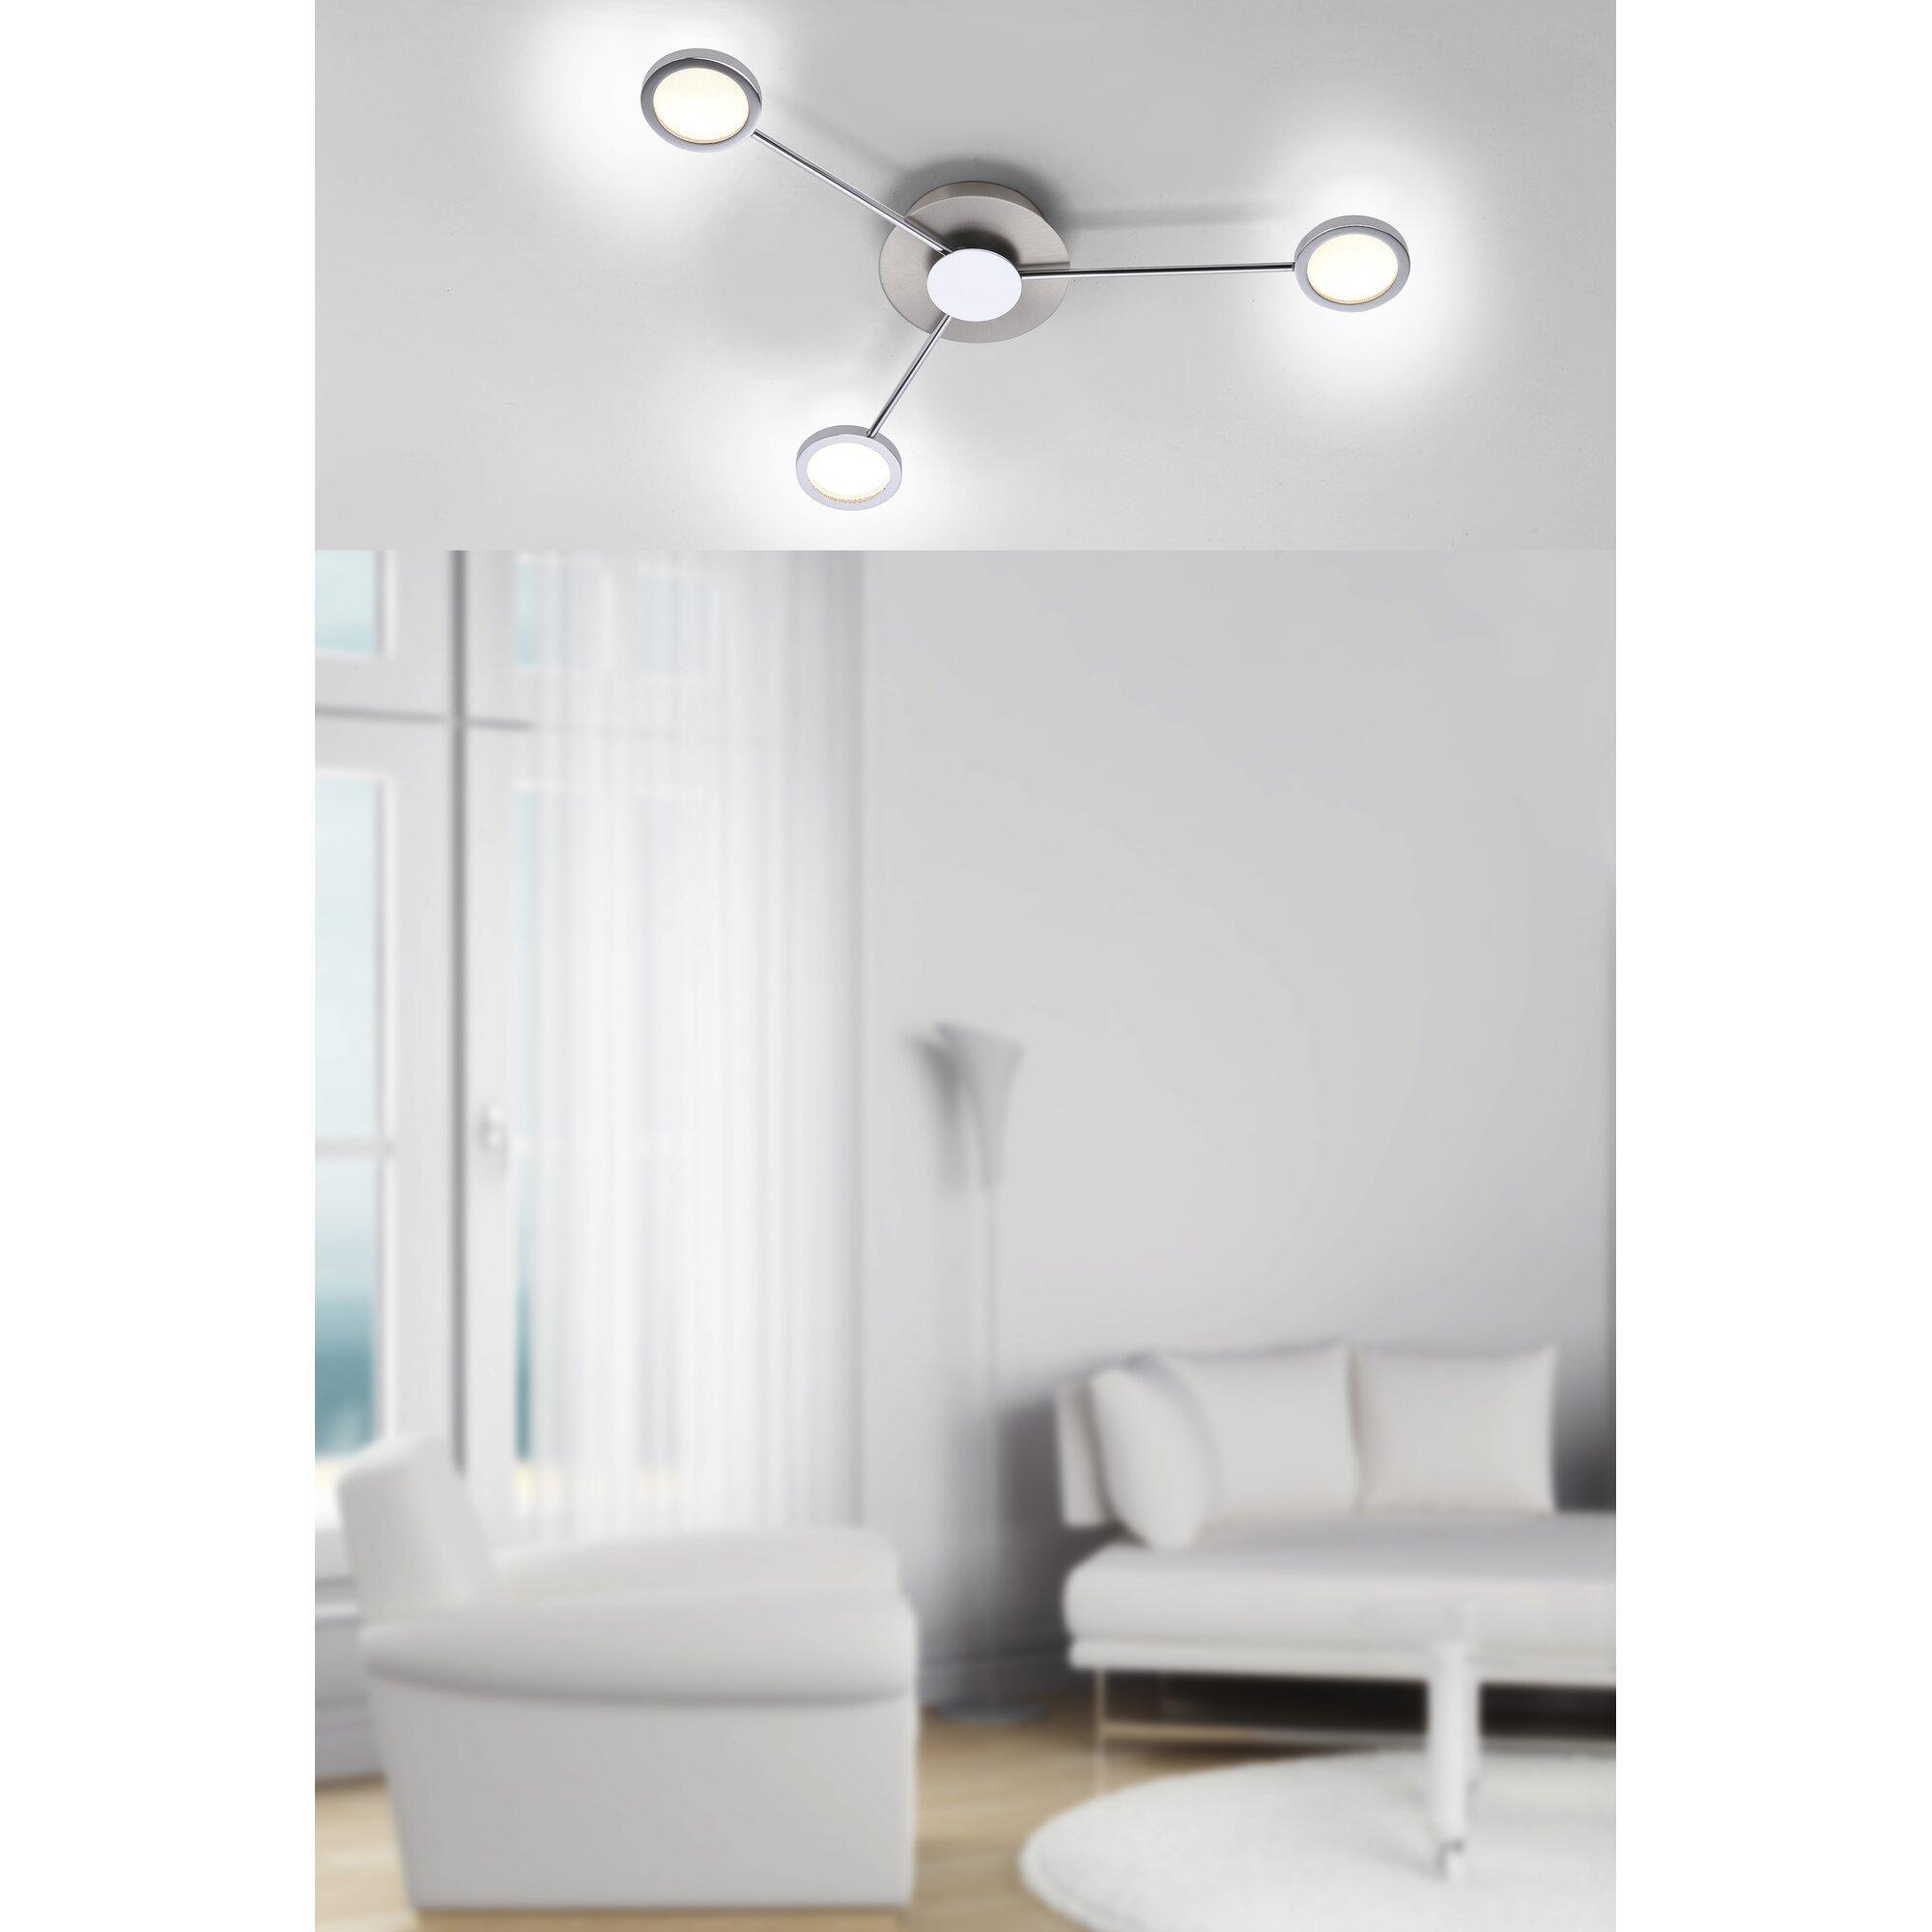 caracella deckenleuchte 3 flammig adela bewertungen. Black Bedroom Furniture Sets. Home Design Ideas